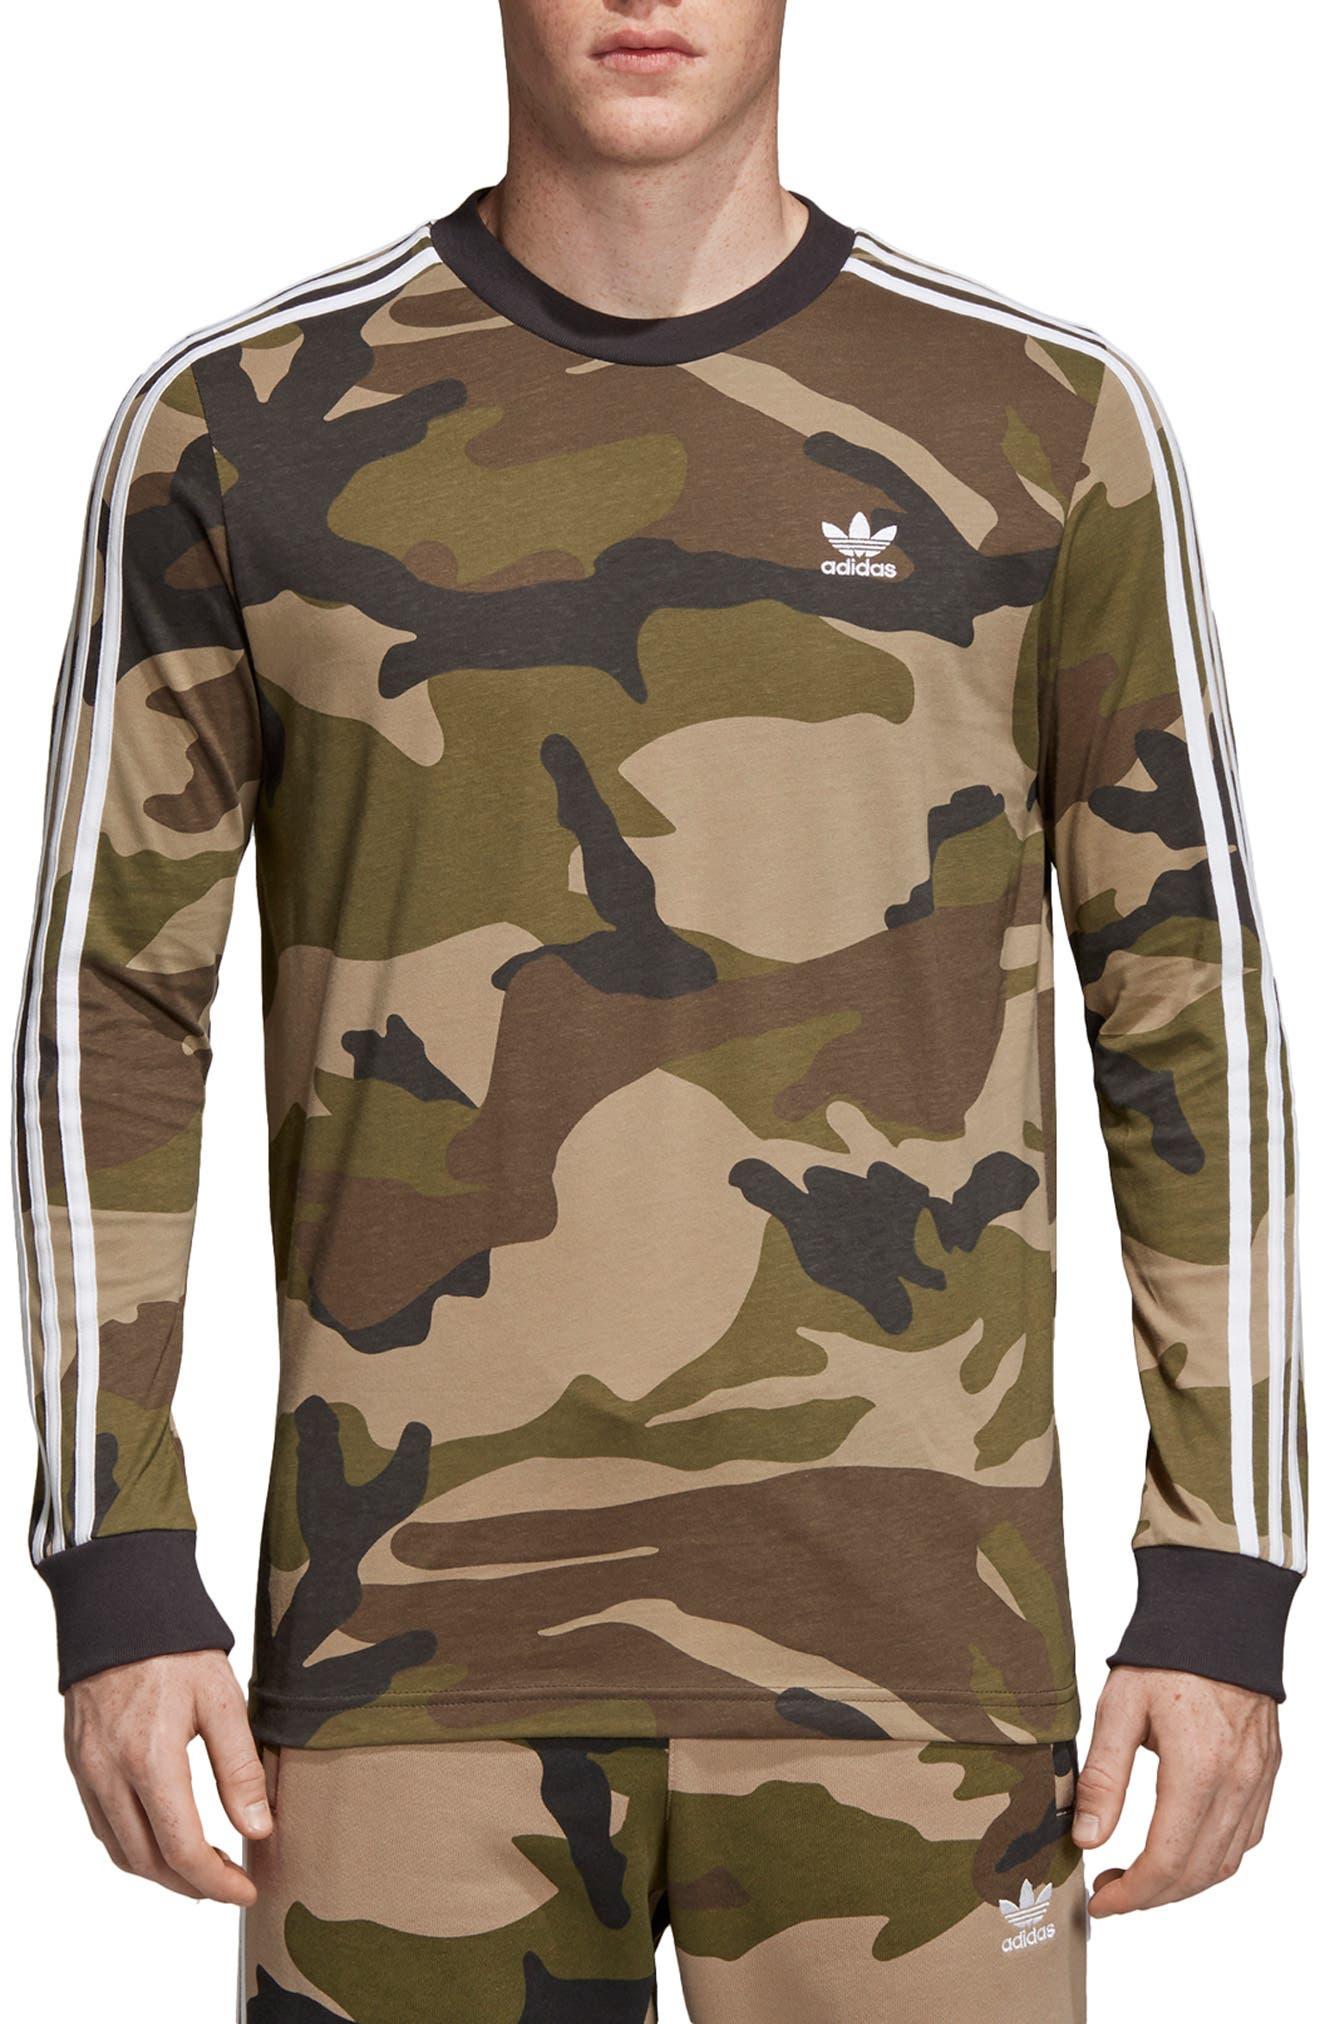 Adidas Originals Camo Long Sleeve T-Shirt, Green